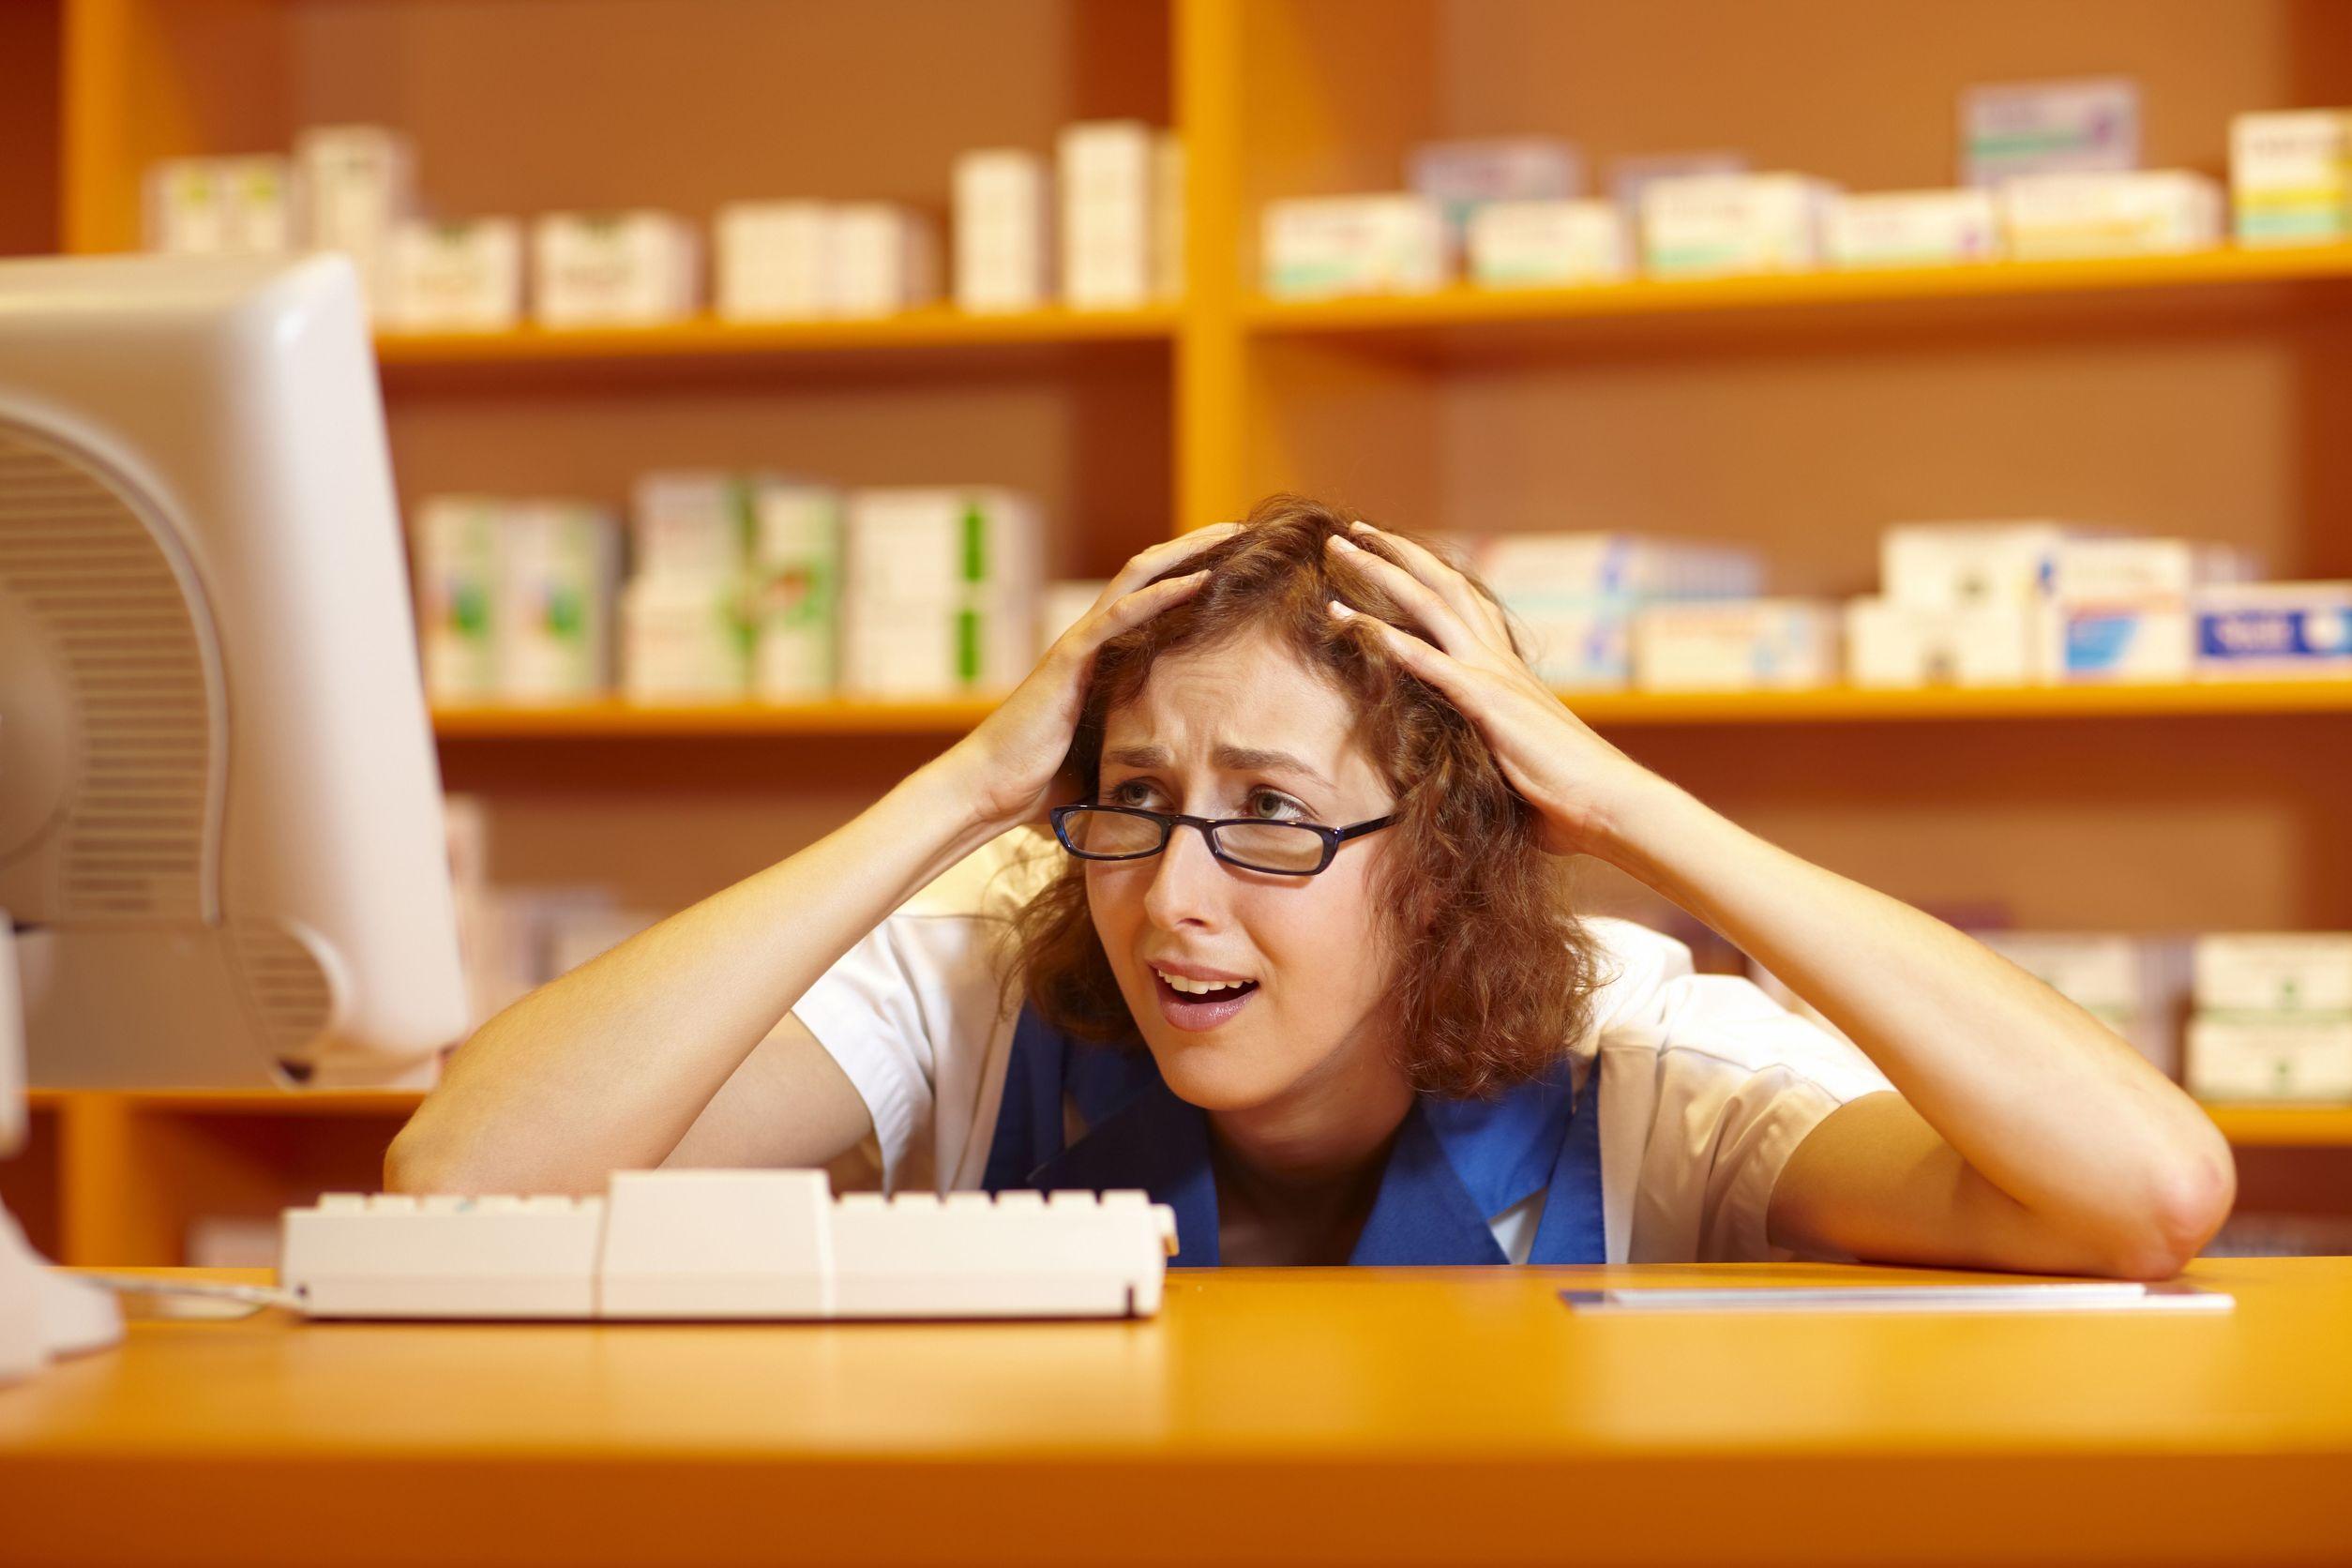 Stressed pharmacist in dispensary